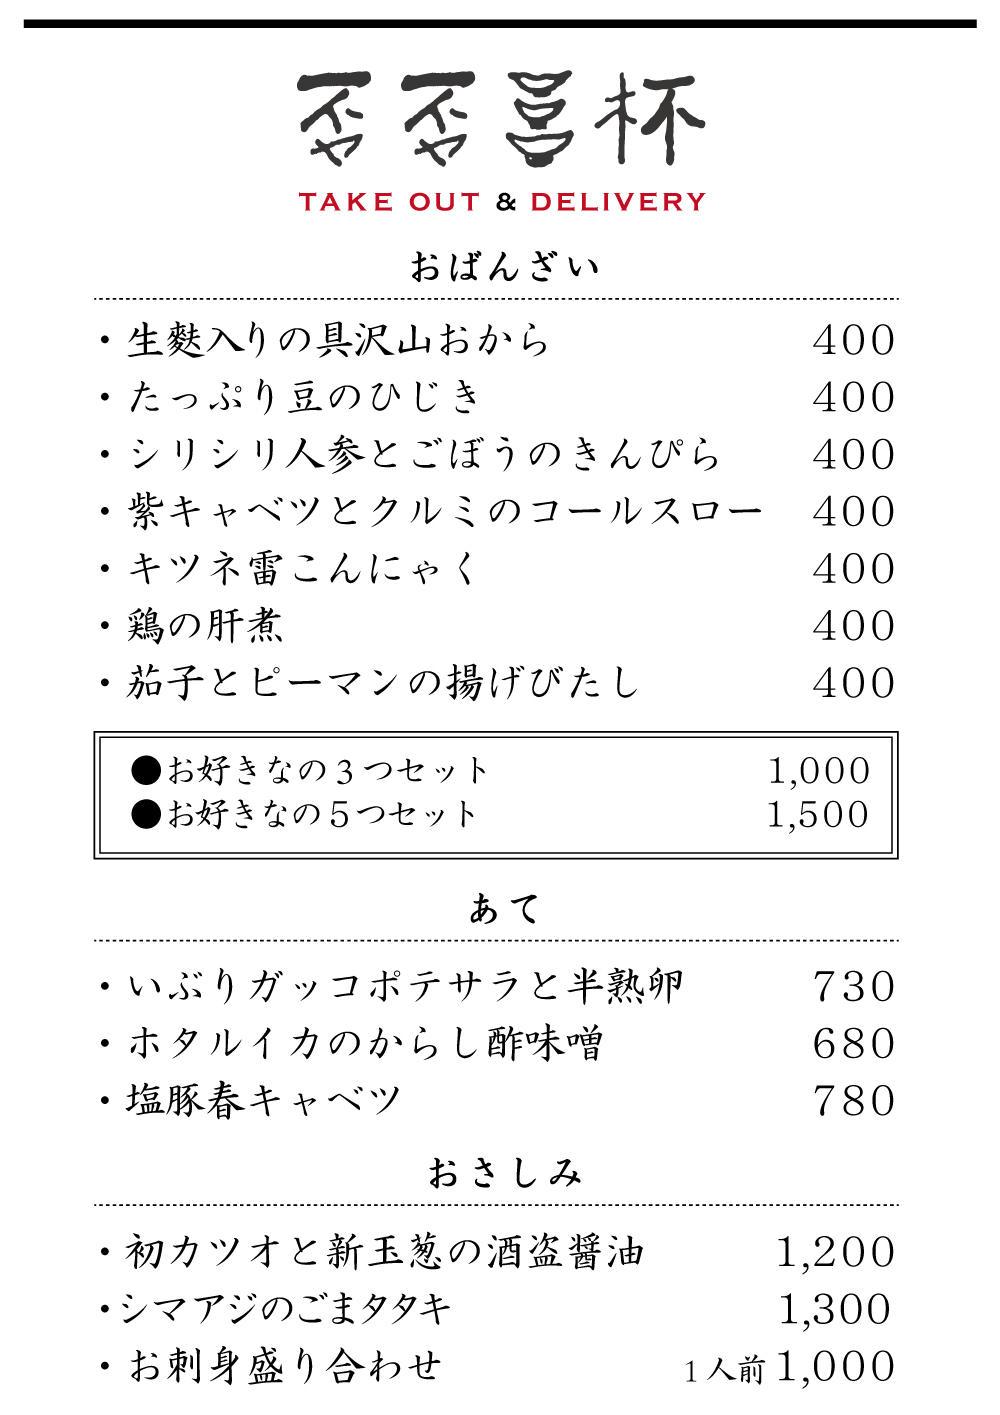 iya_takeout_1.jpg